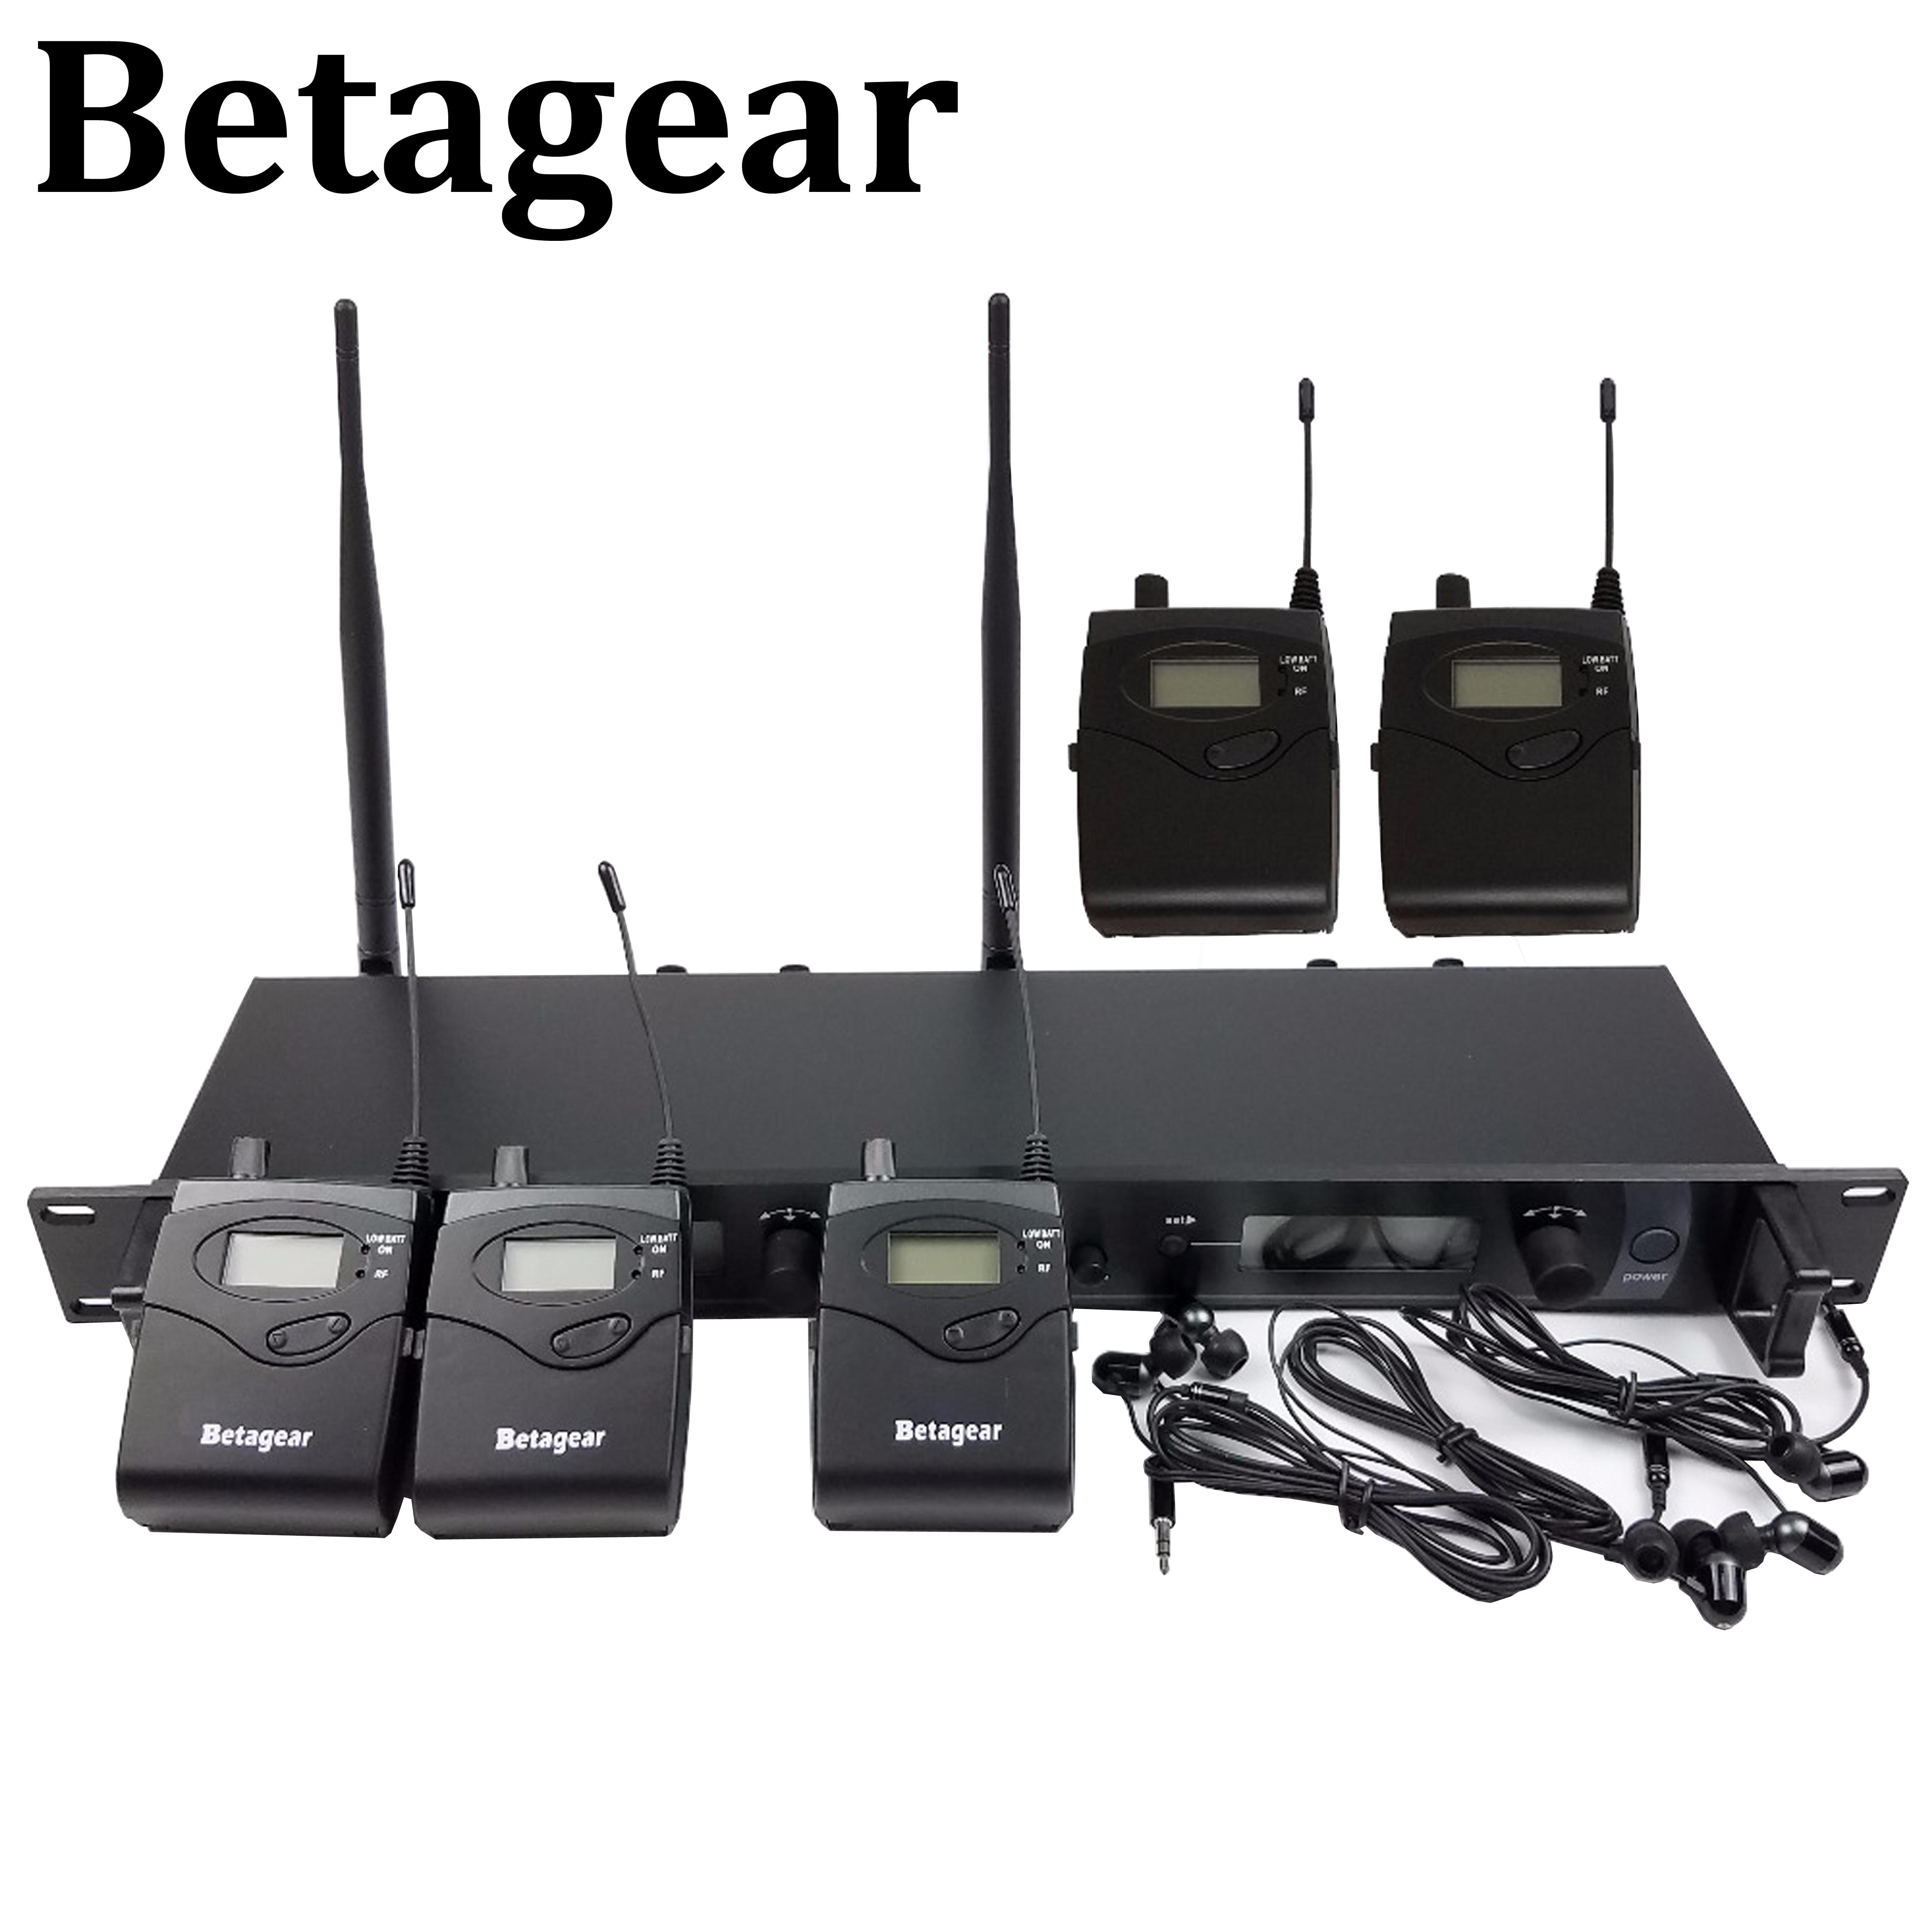 Betagear SR2050 IEM 5 Empfänger Wireless In-ear-Monitor-System UHF Bühne IEM System Bühne Überwachung 5 Monitor IEM